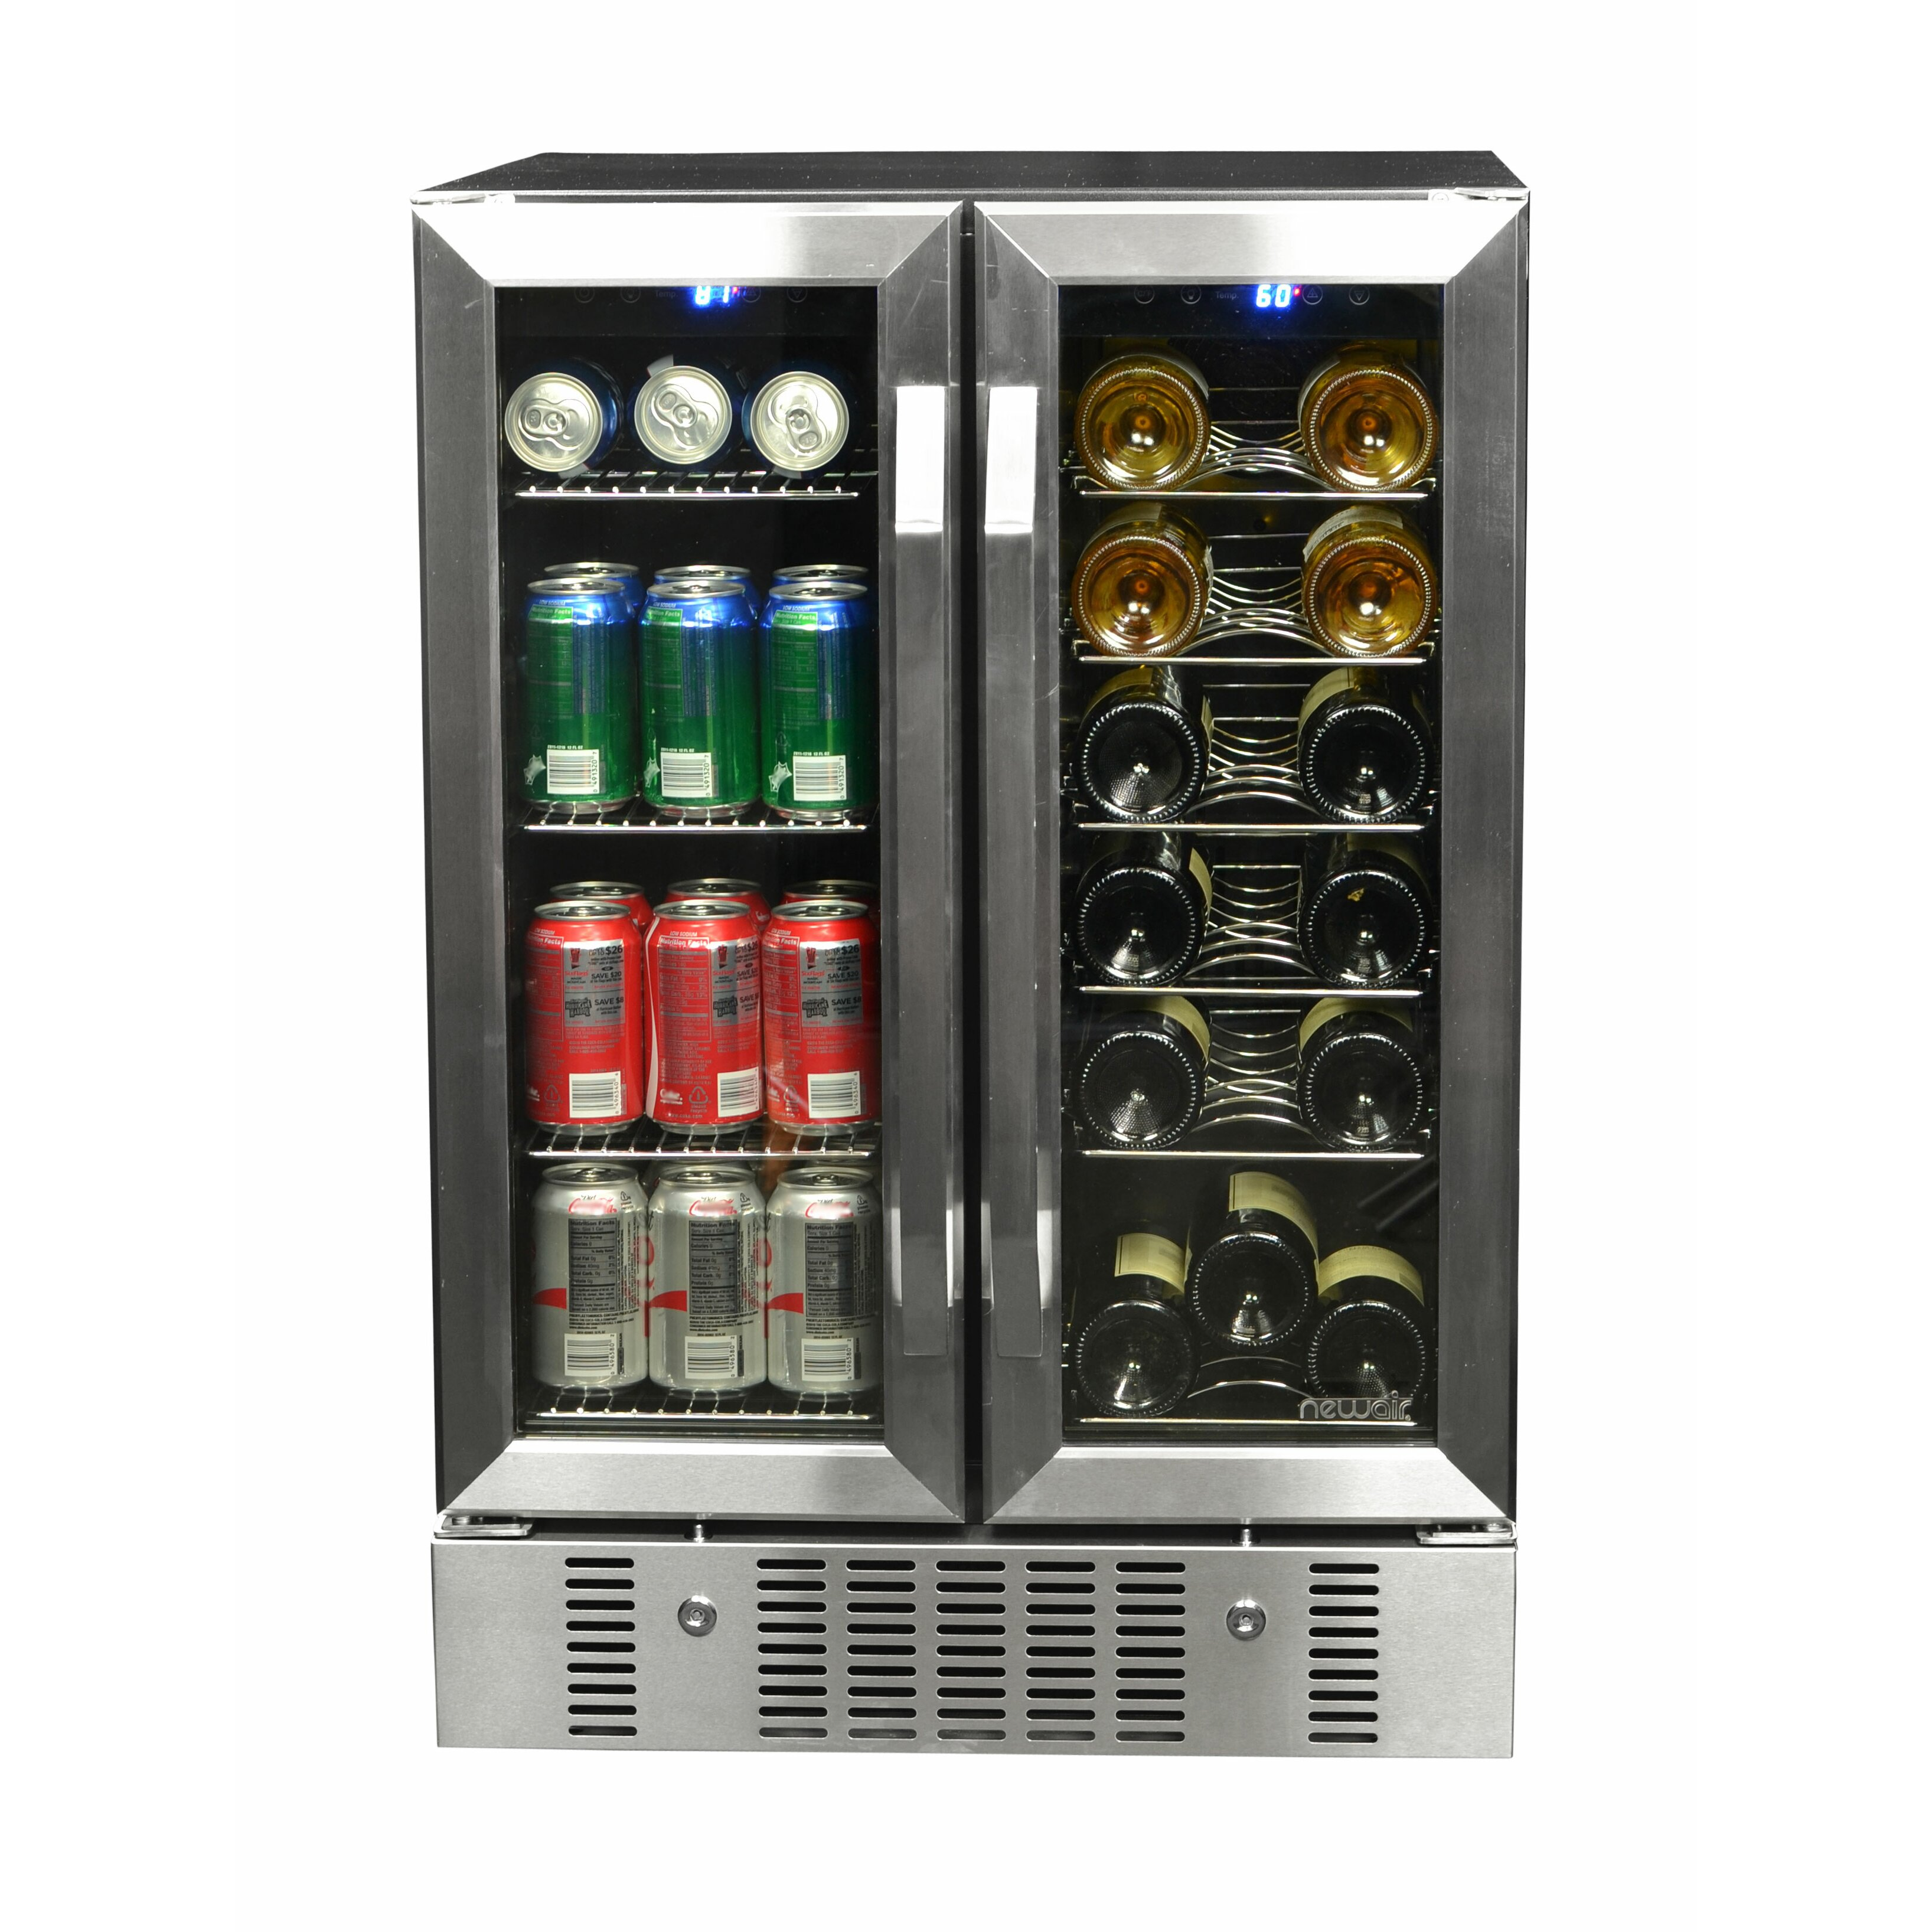 Newair 18 Bottle Dual Zone Built In Wine Refrigerator